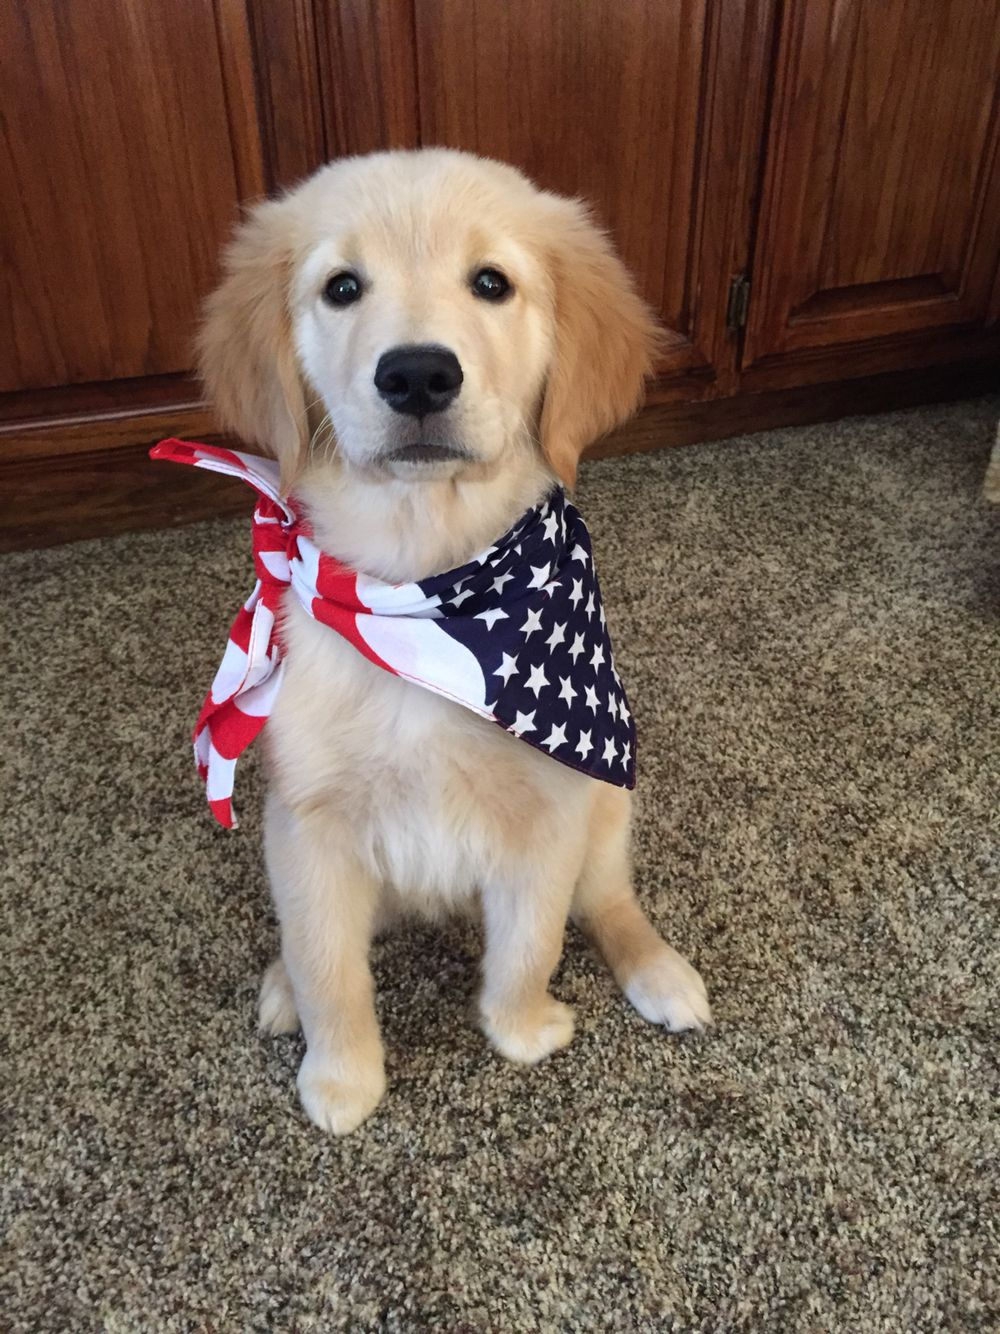 American Golden Retriever puppy Golden retriever